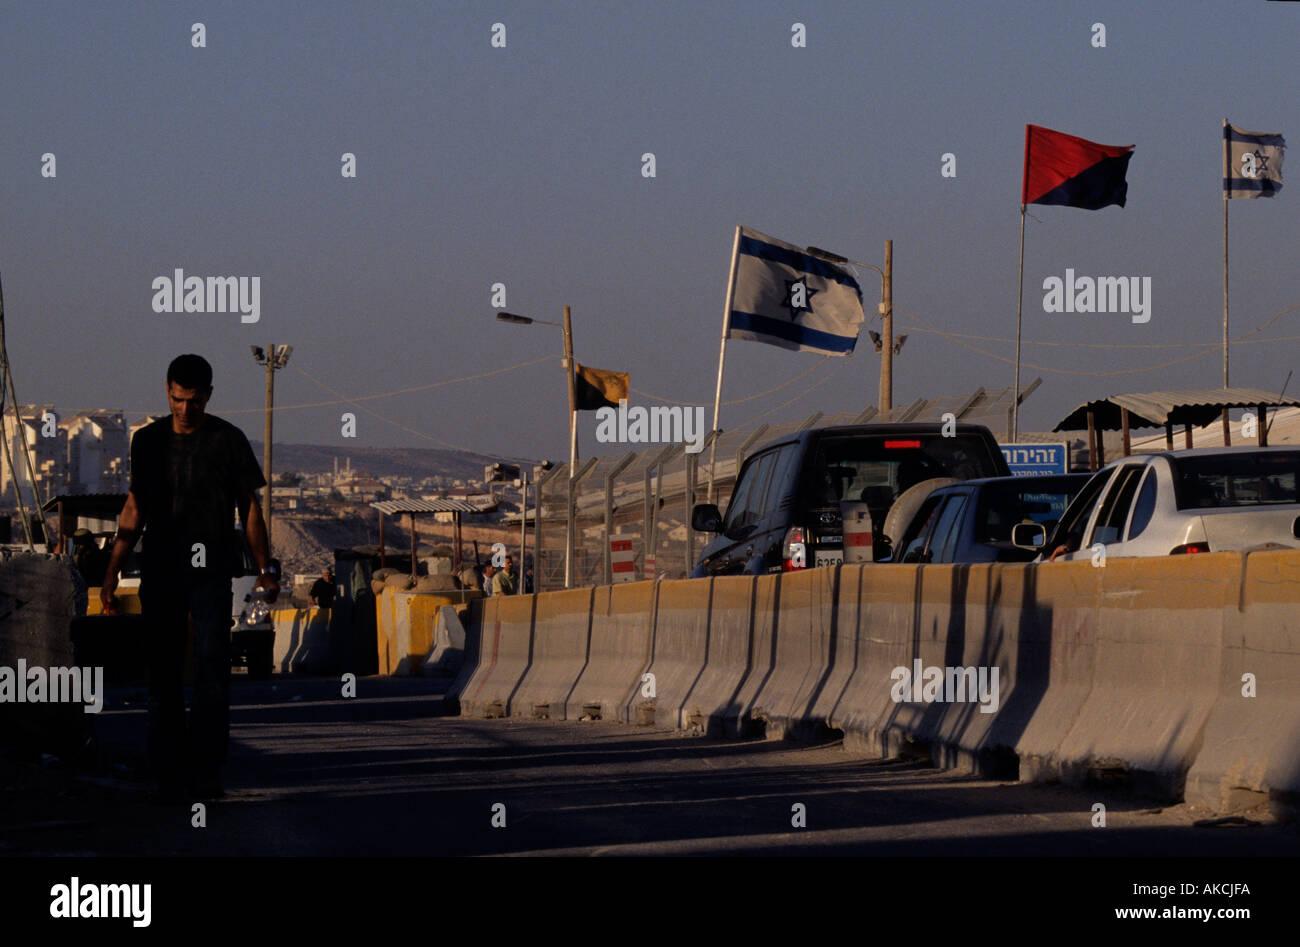 A man walking along a Palestinian highway - Stock Image